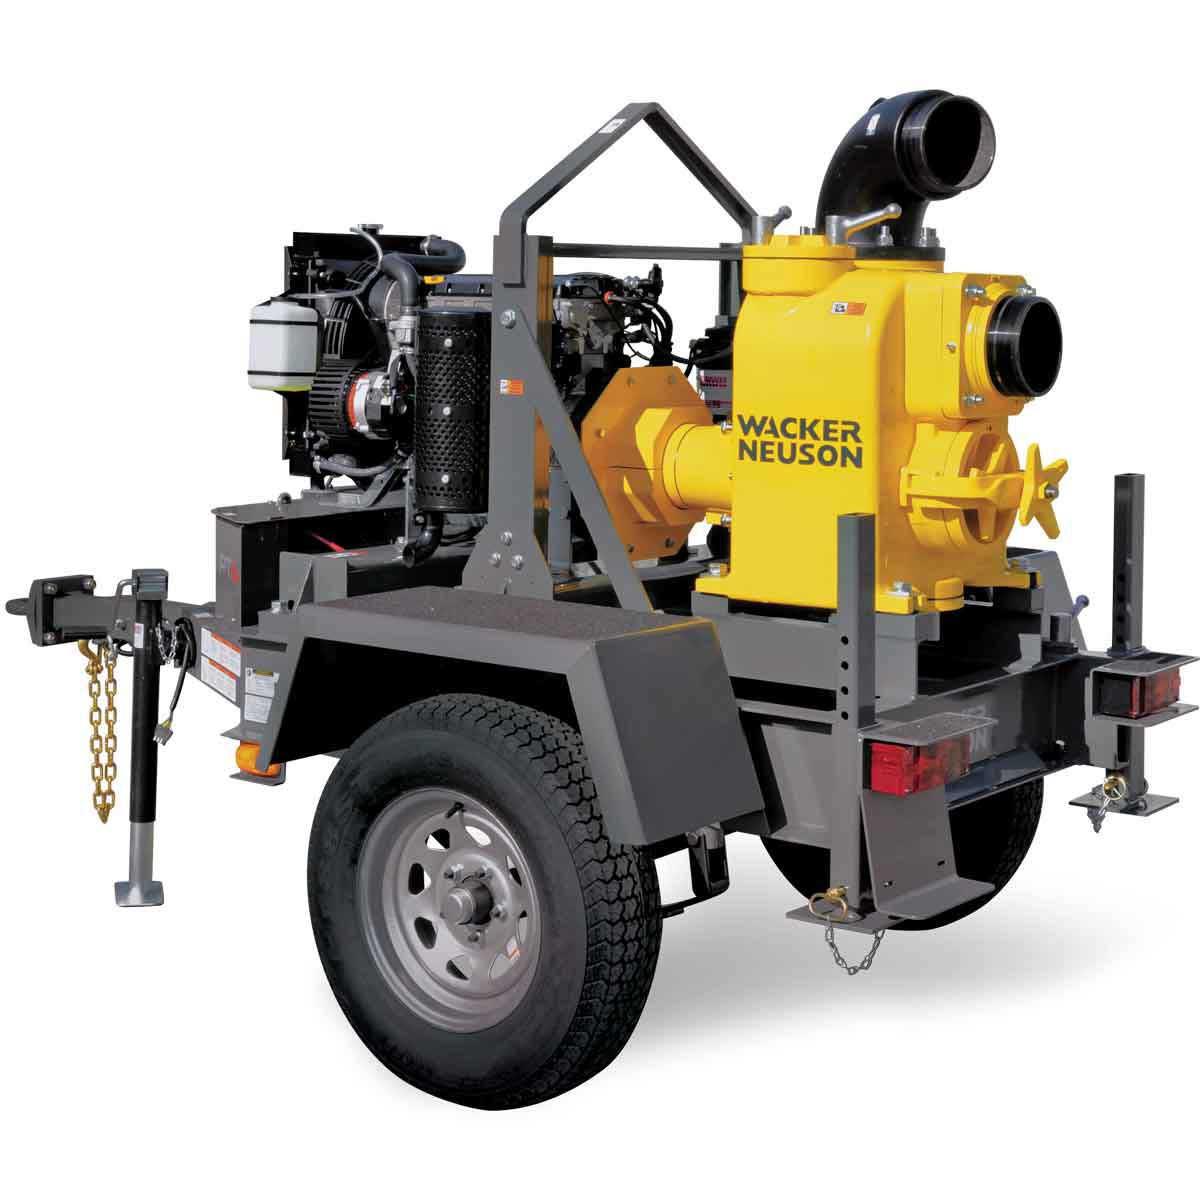 Wacker Neuson PTS 6LT 6 inch Centrifugal Trash Pump